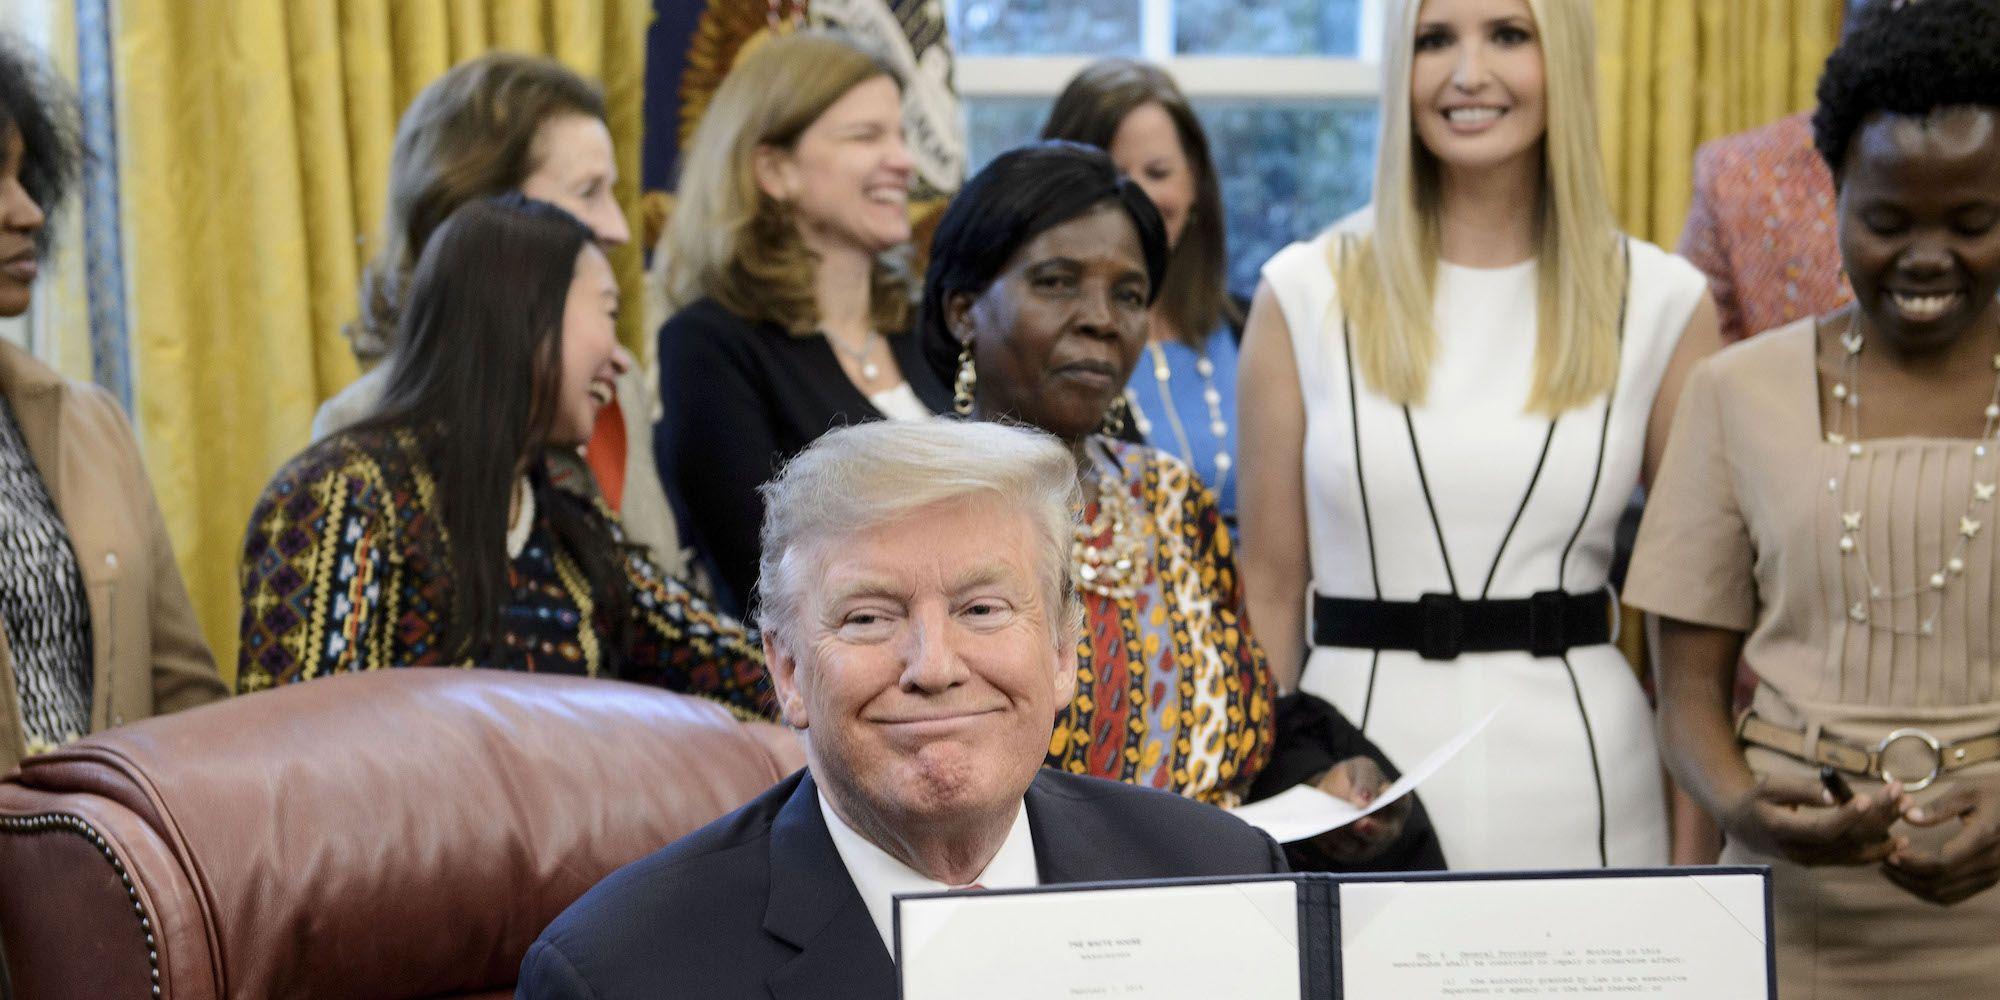 US-POLITICS-WOMEN-GLOBAL DEVELOPMENT